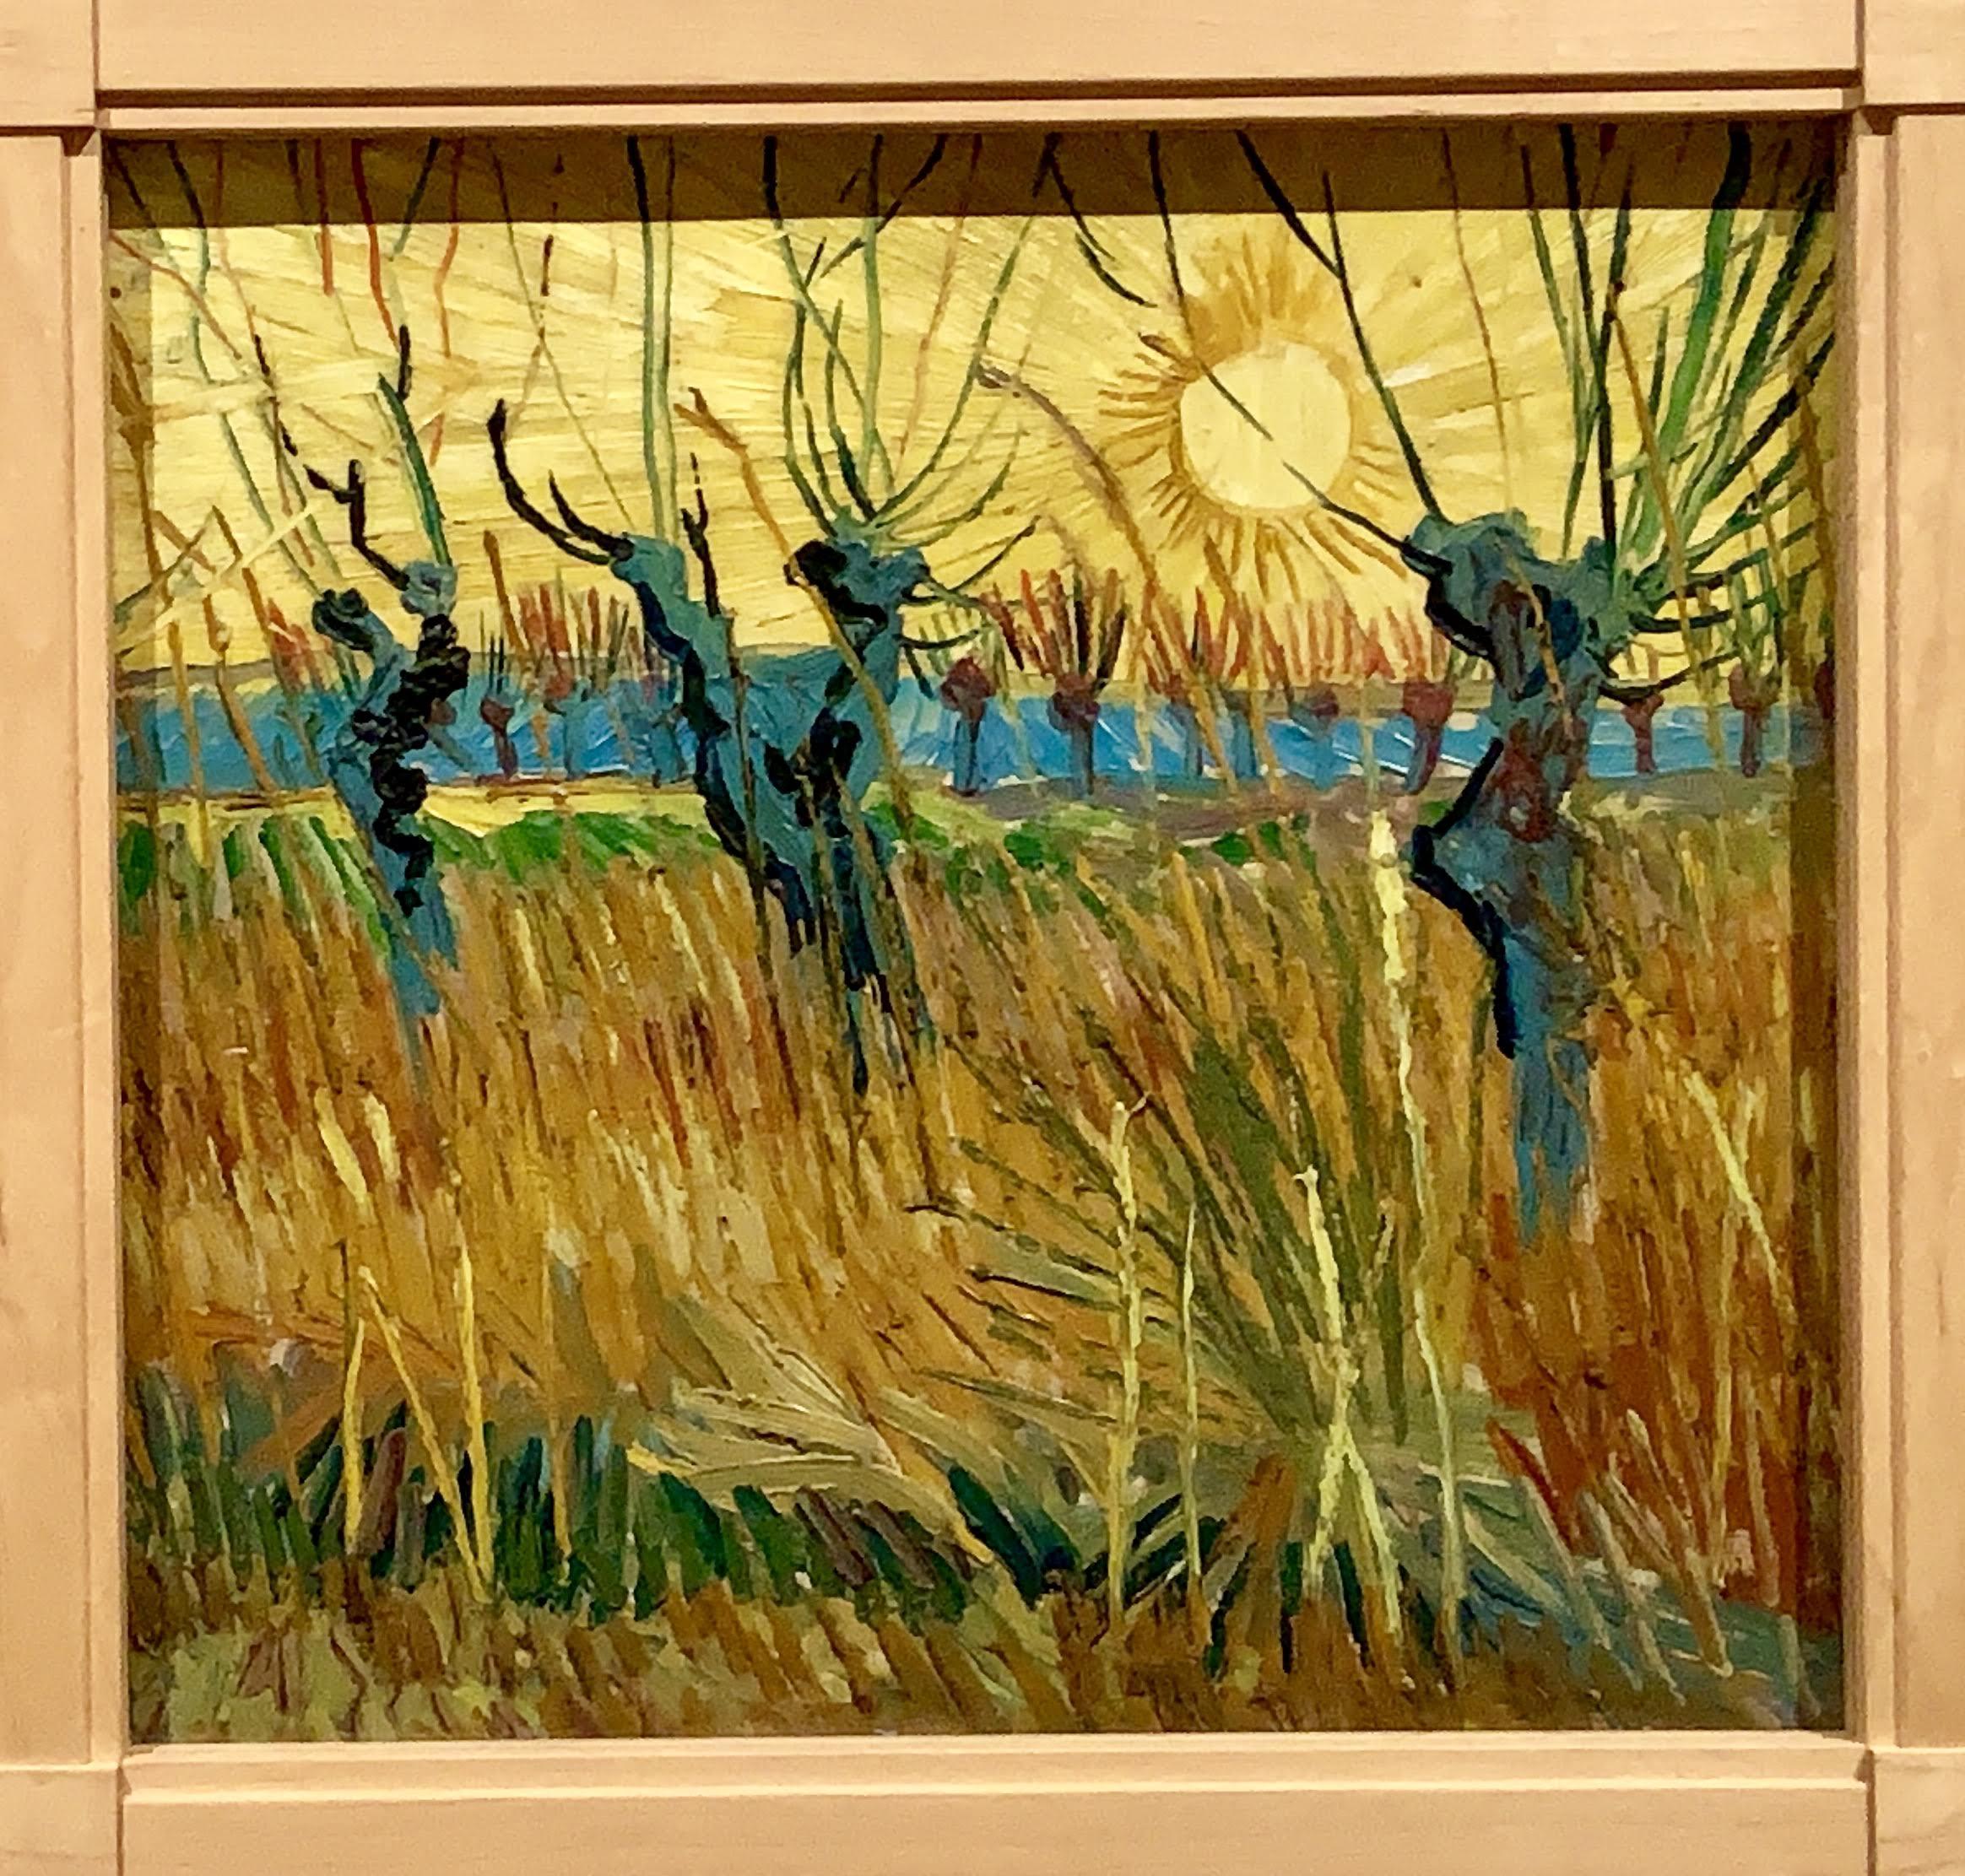 Vincent van Gogh - Pollard willows at sunset, 1888